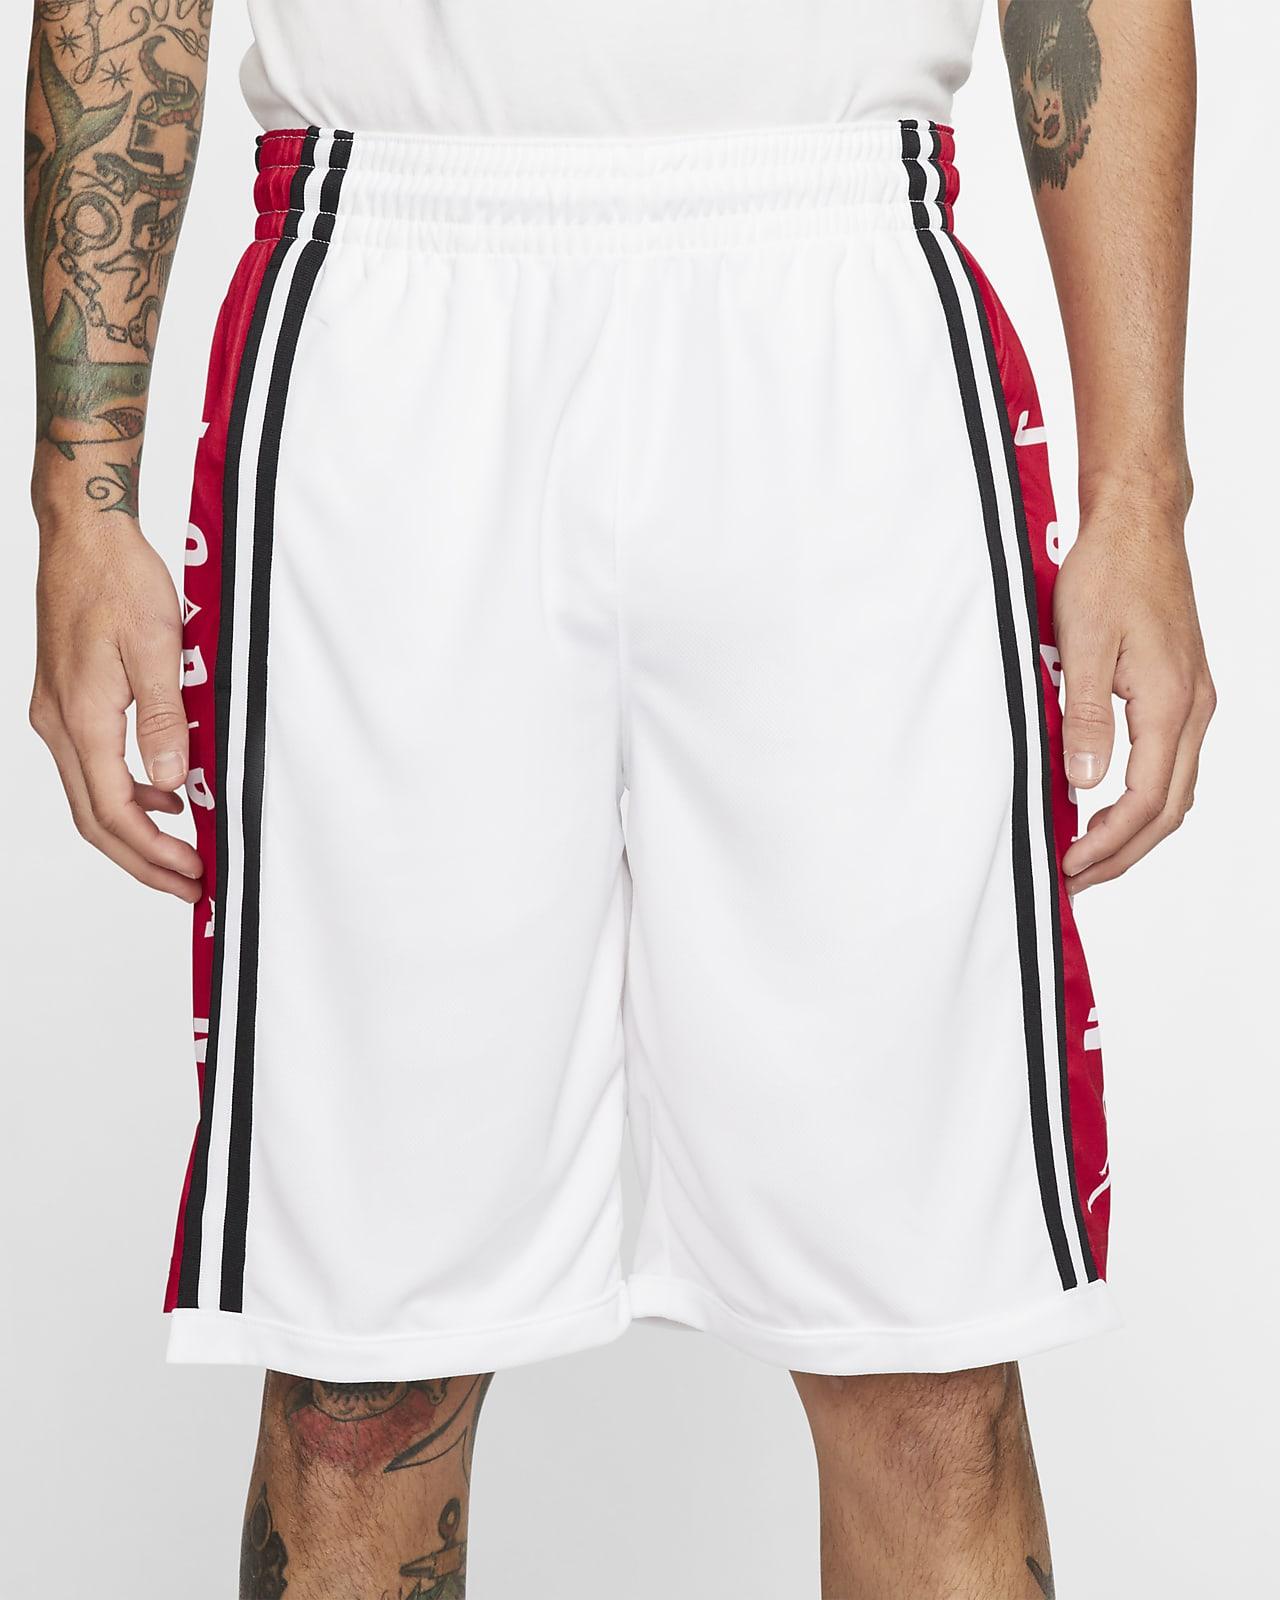 Jordan HBR Men's Basketball Shorts